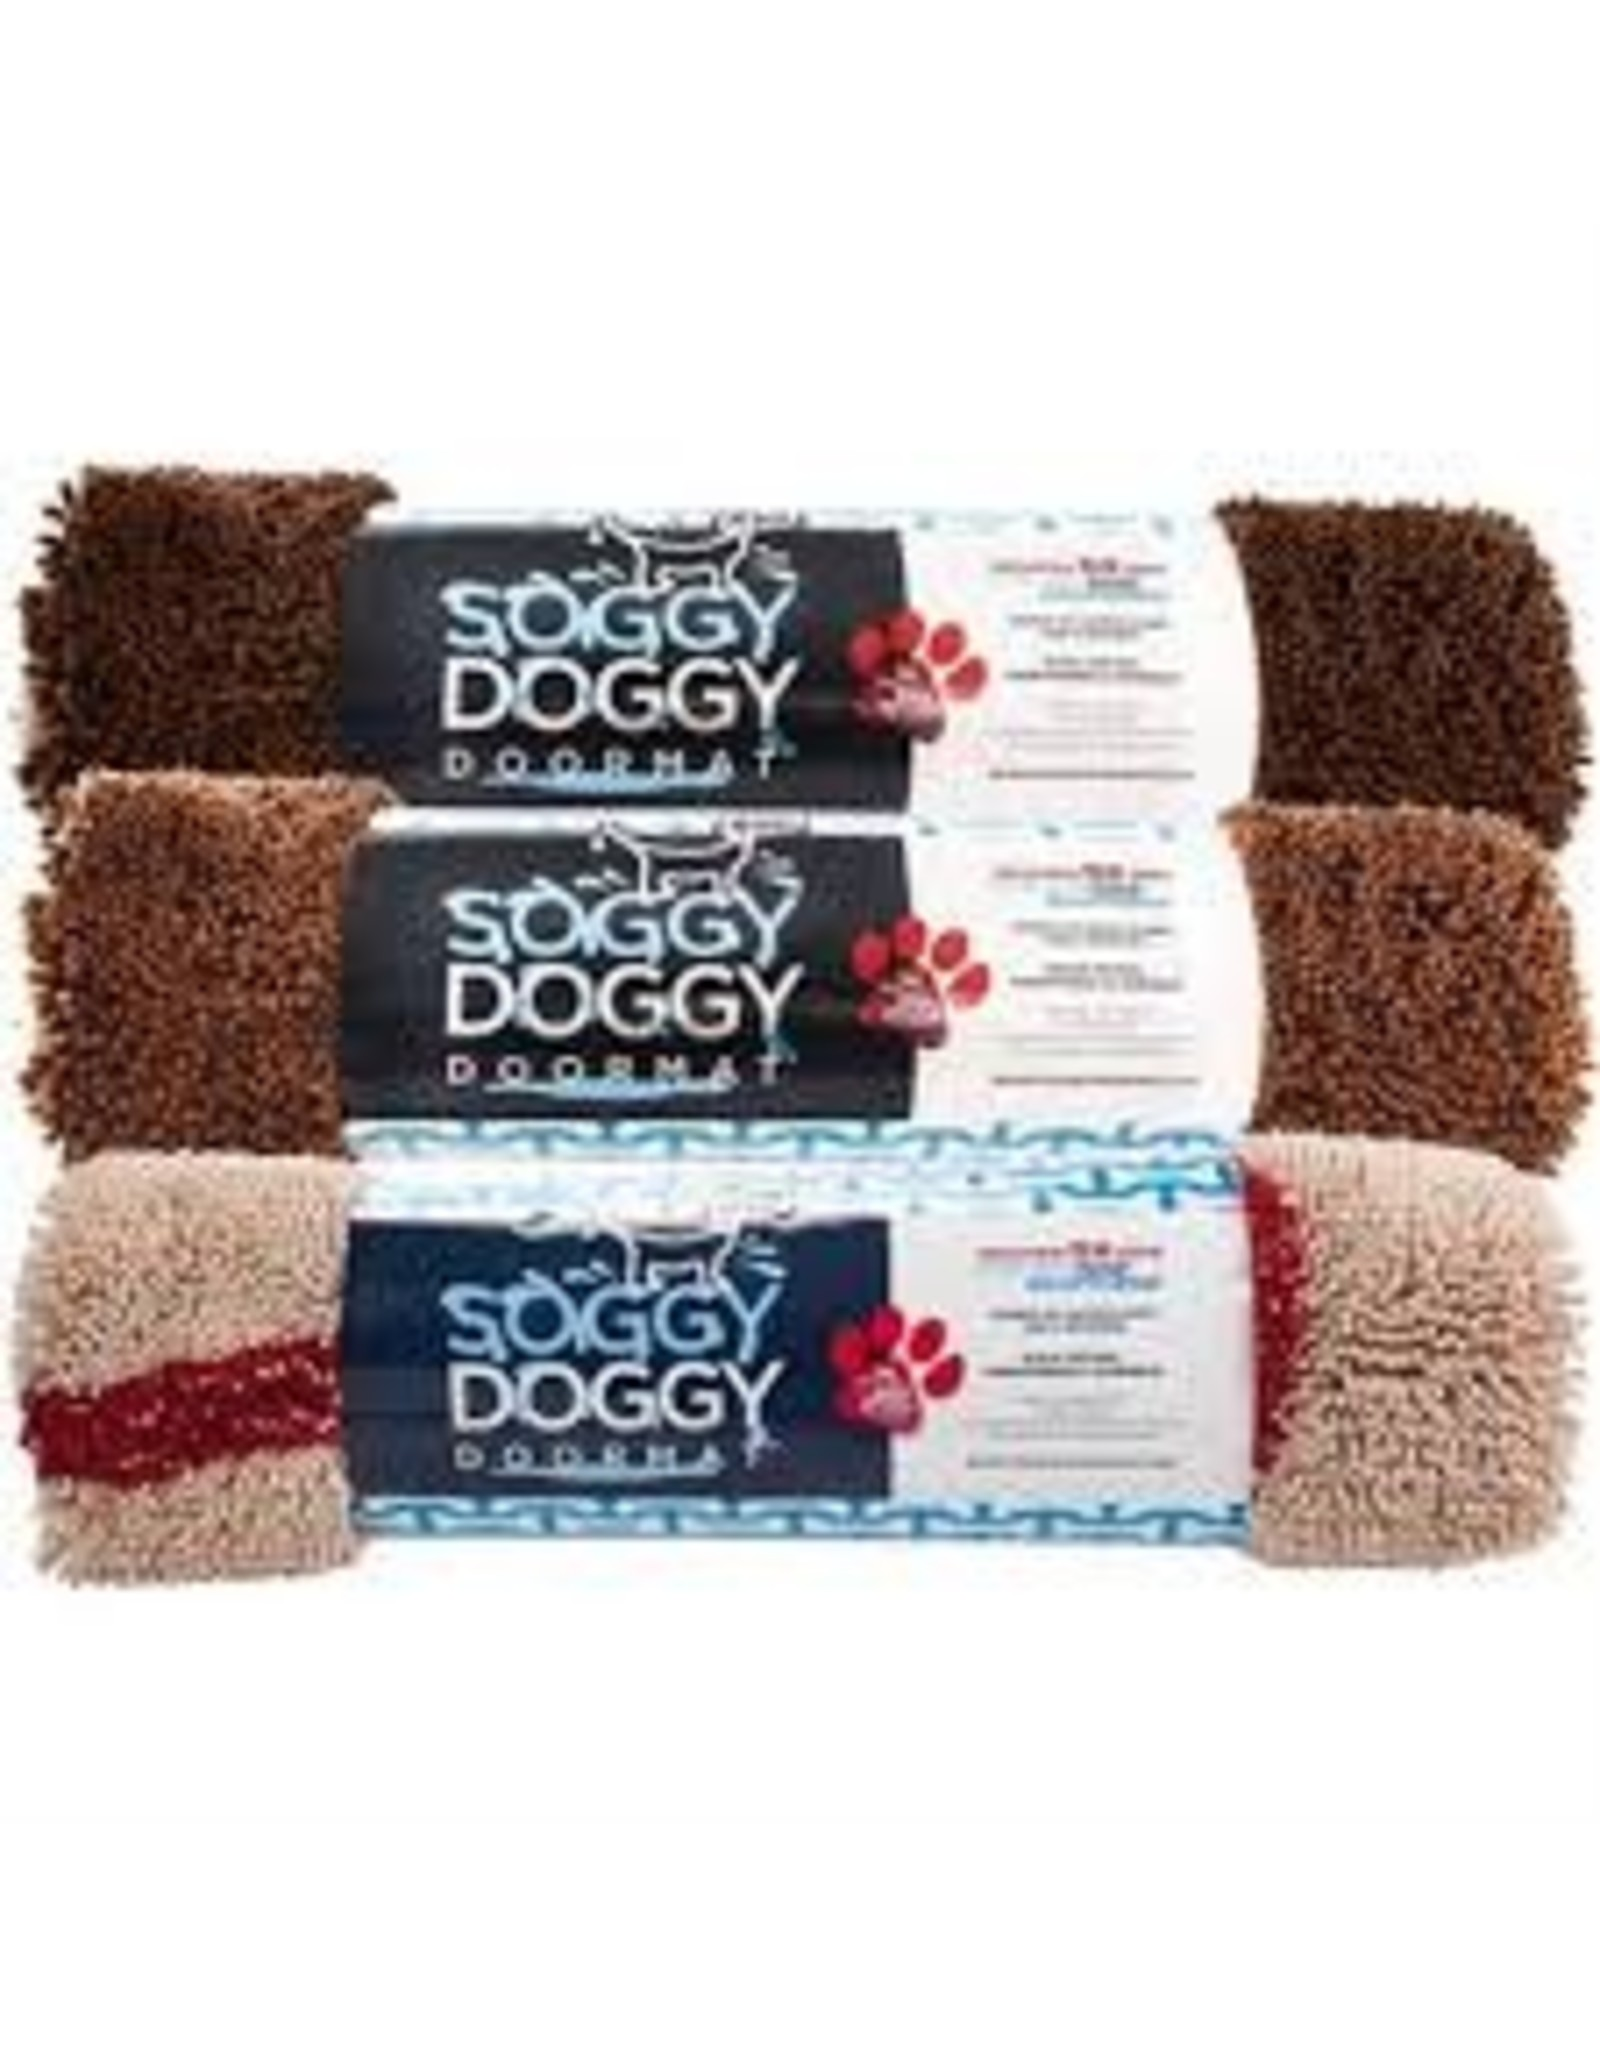 SOGGY DOGGY SOGGY DOGGY DOORMAT CHOCOLATE 36X60